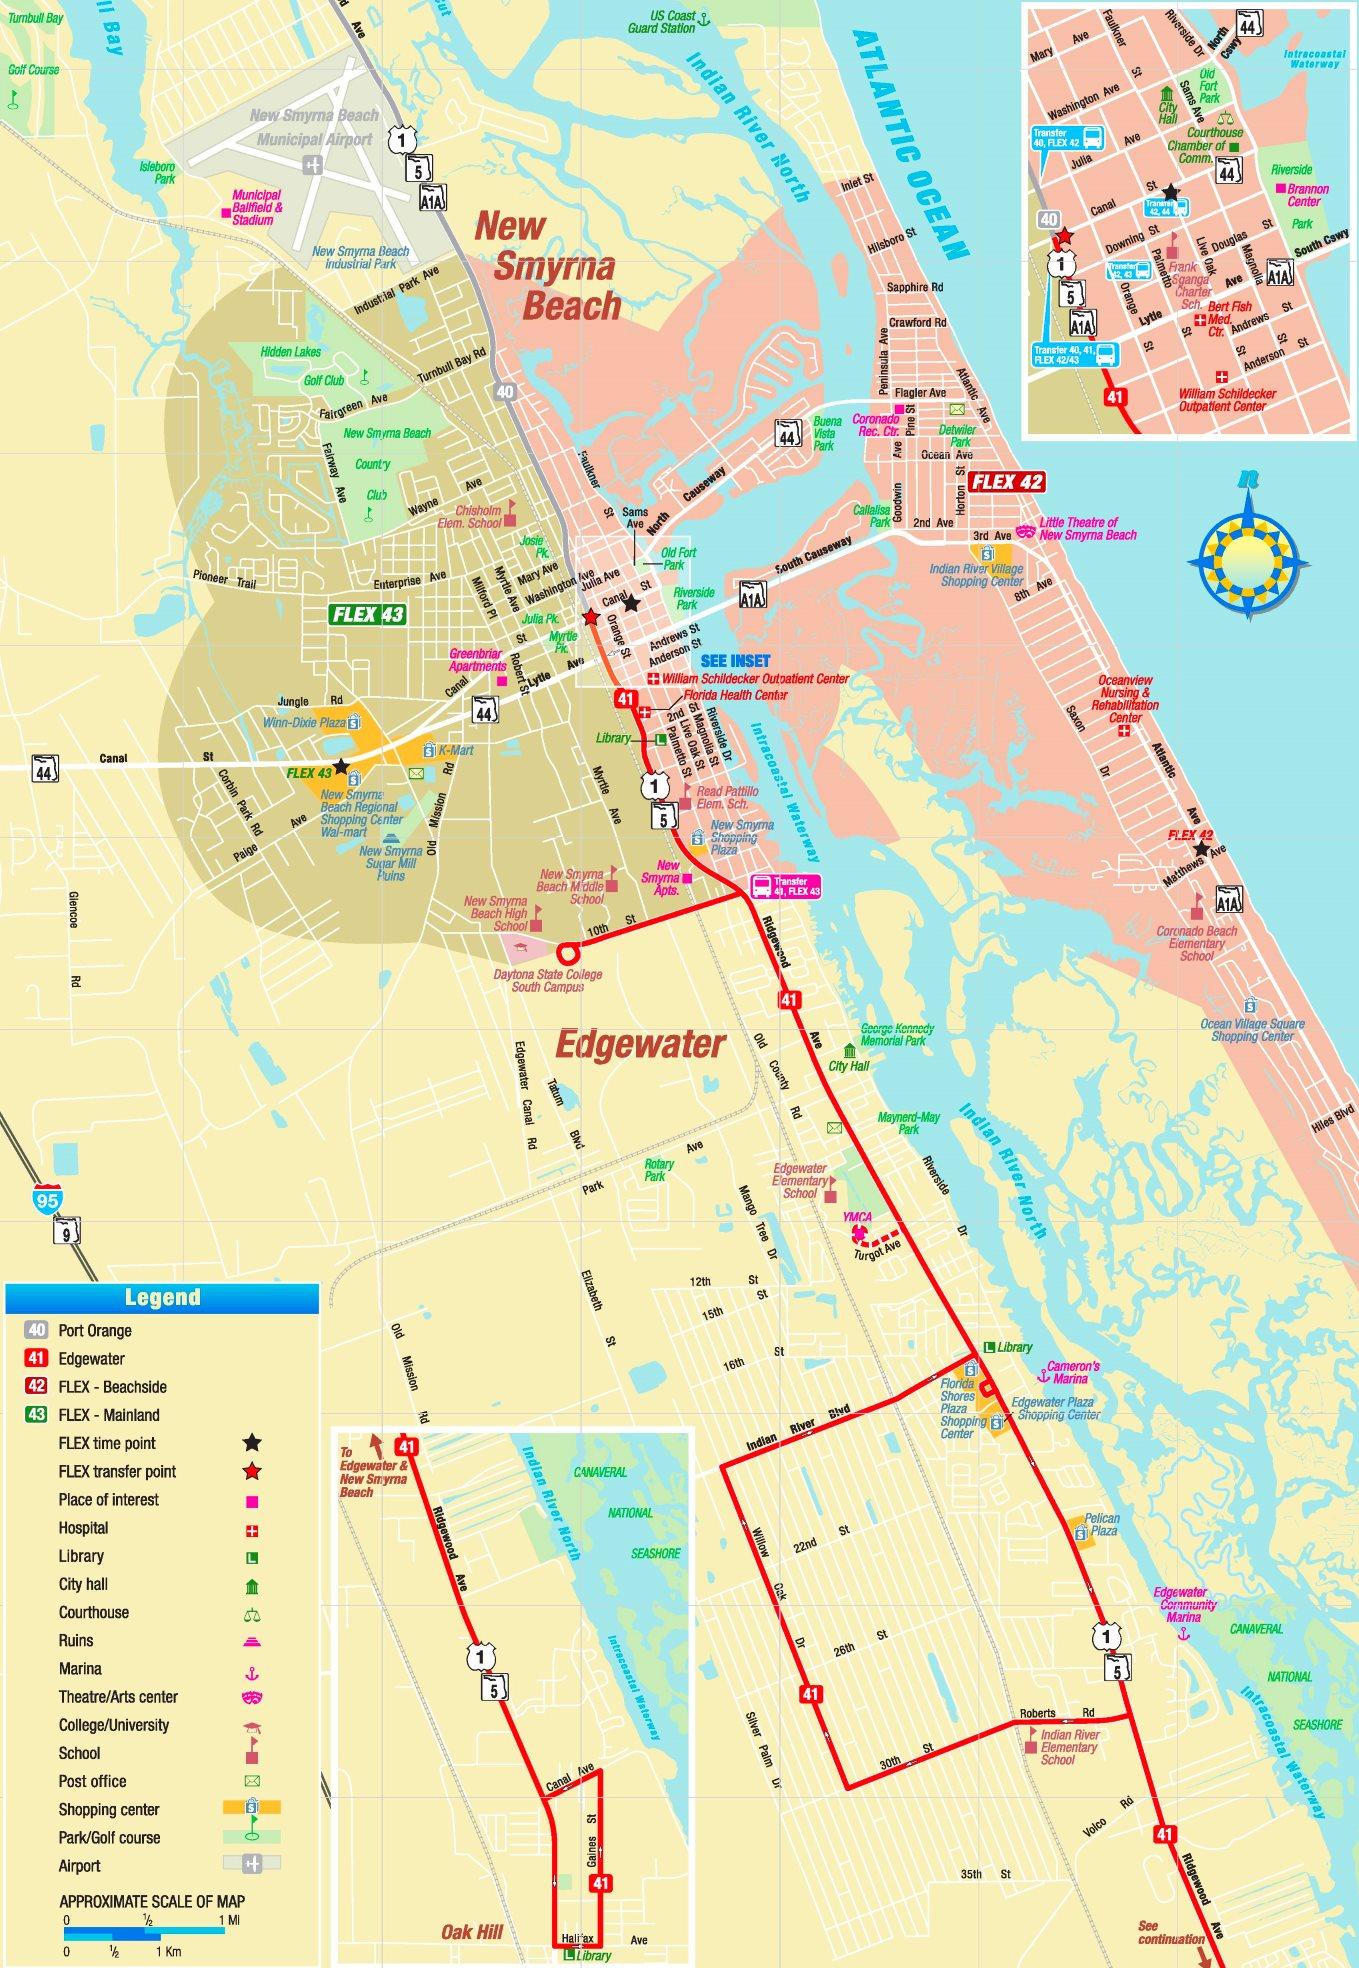 New Smyrna Beach Map New Smyrna Beach tourist map